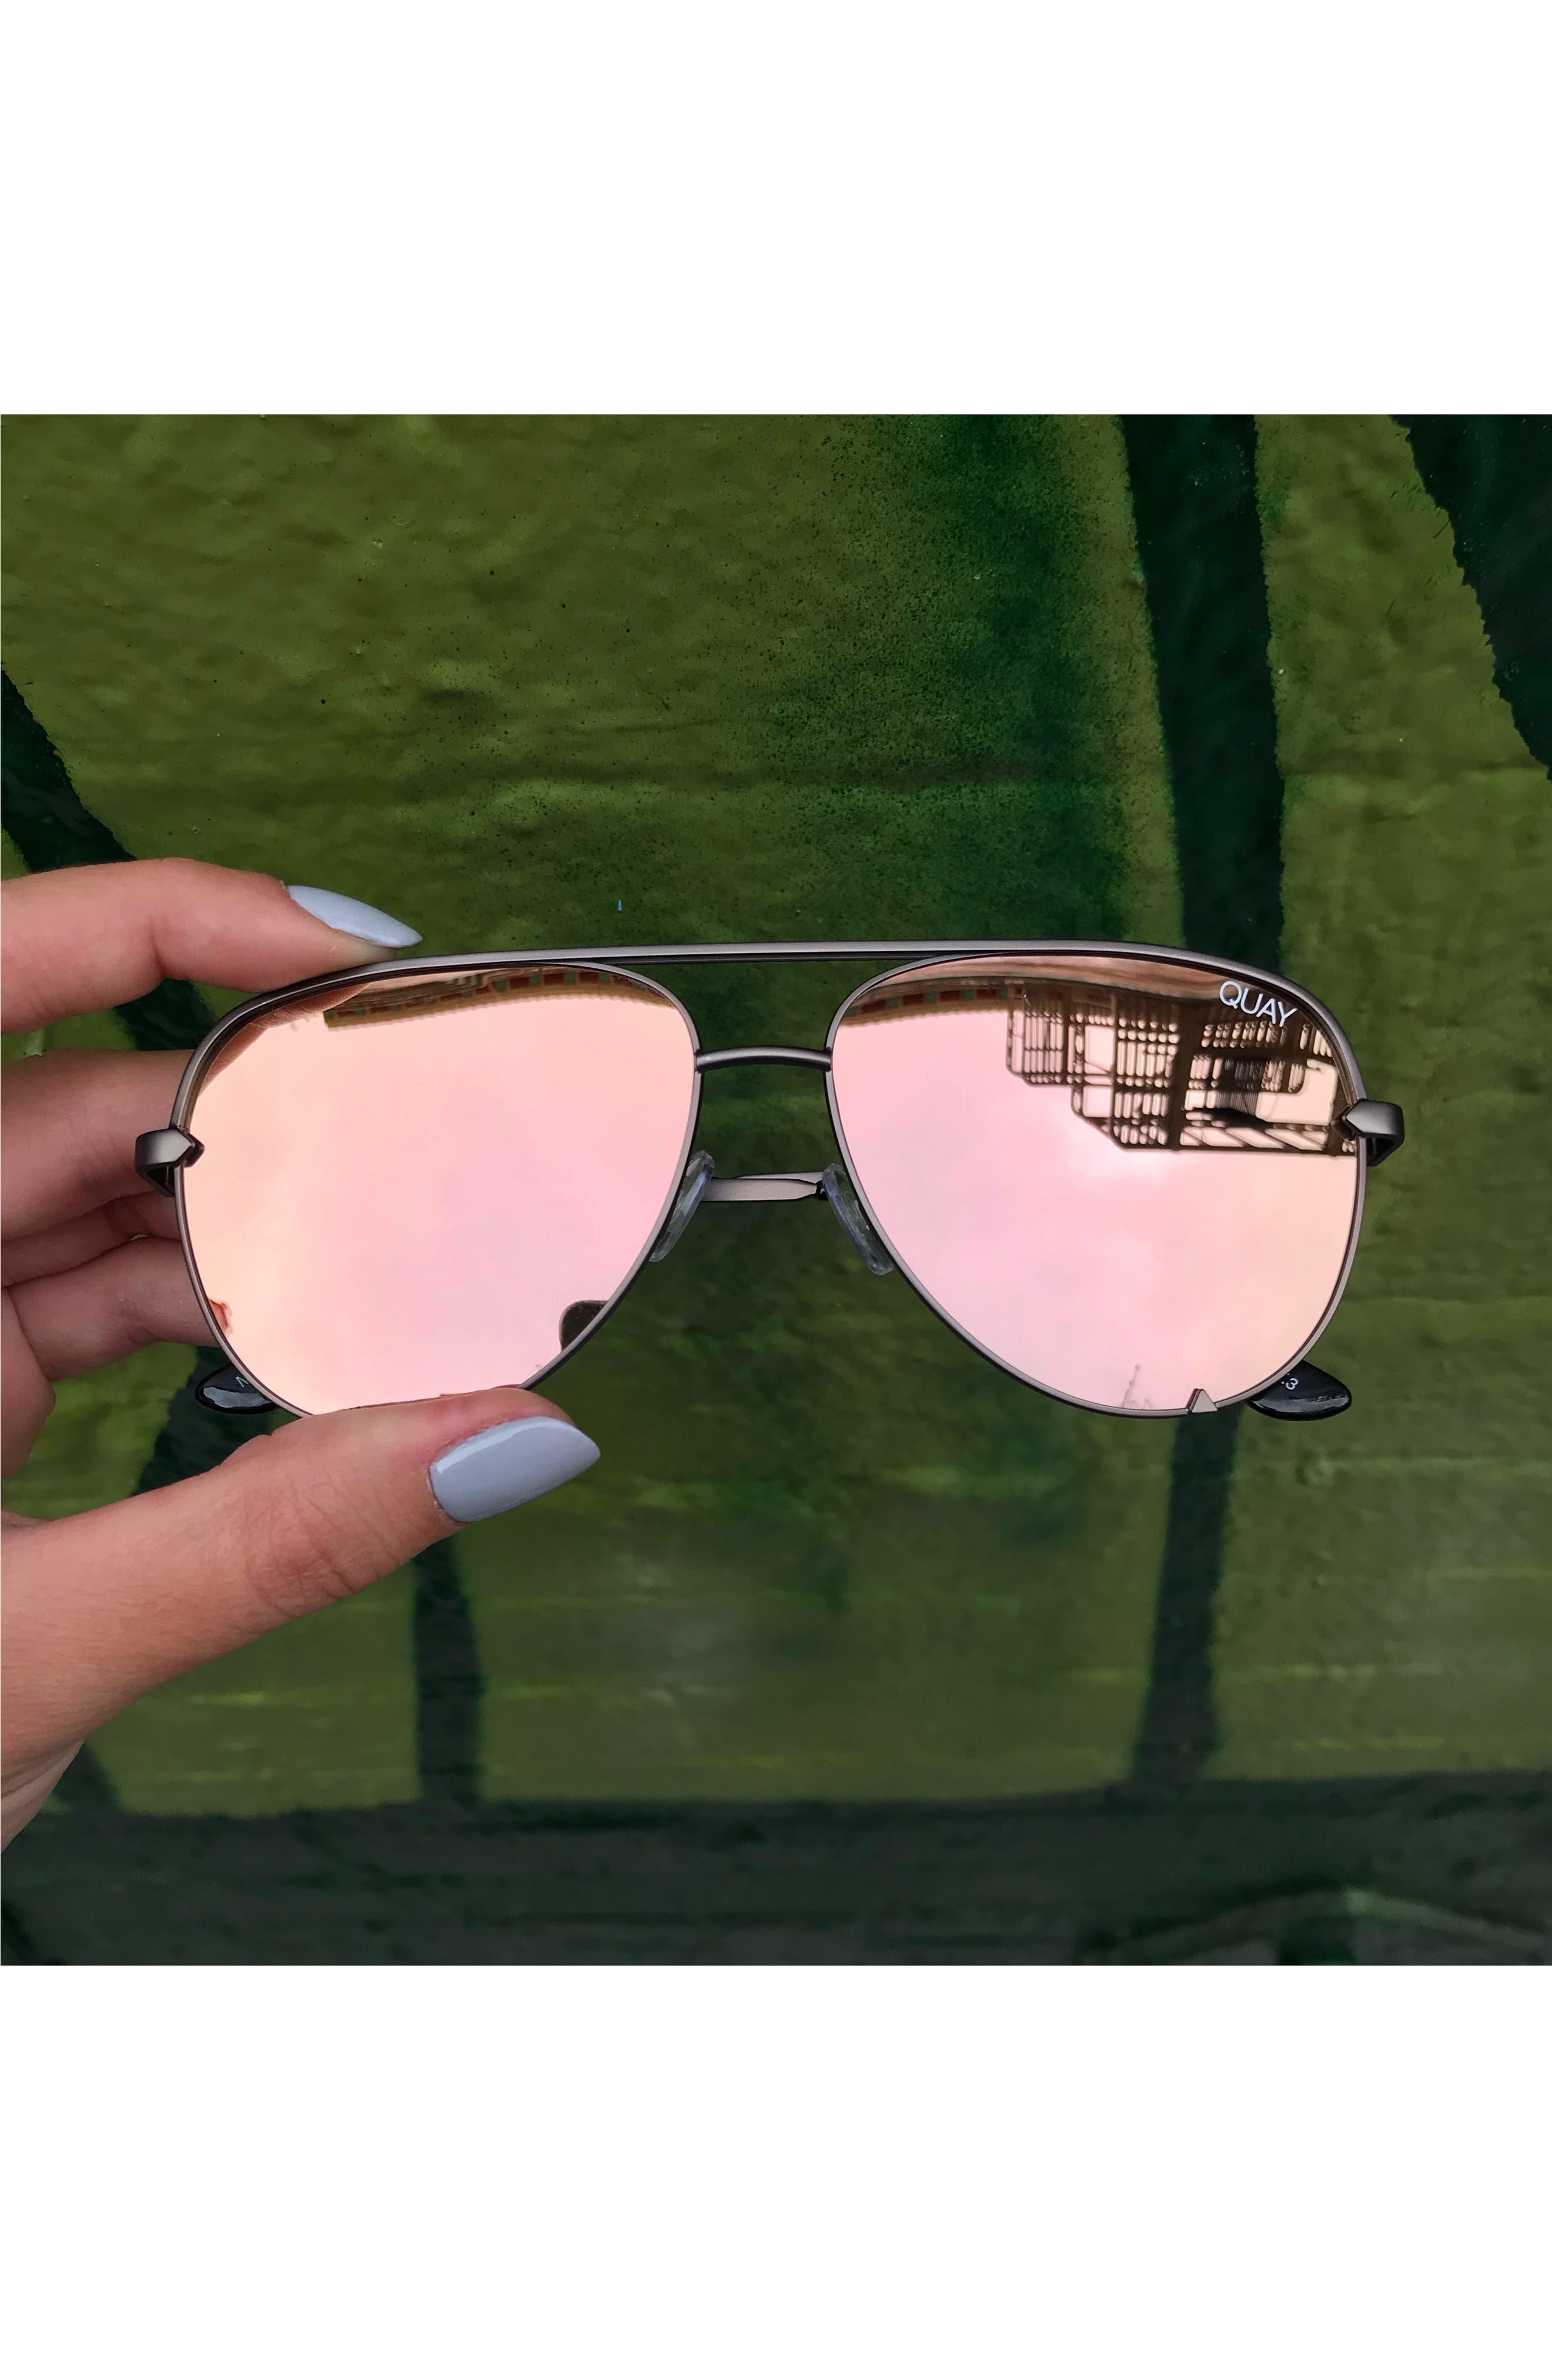 x Desi Perkins High Key Mini 57mm Aviator Sunglasses,                             Alternate thumbnail 5, color,                             GUNMETAL/ ROSE